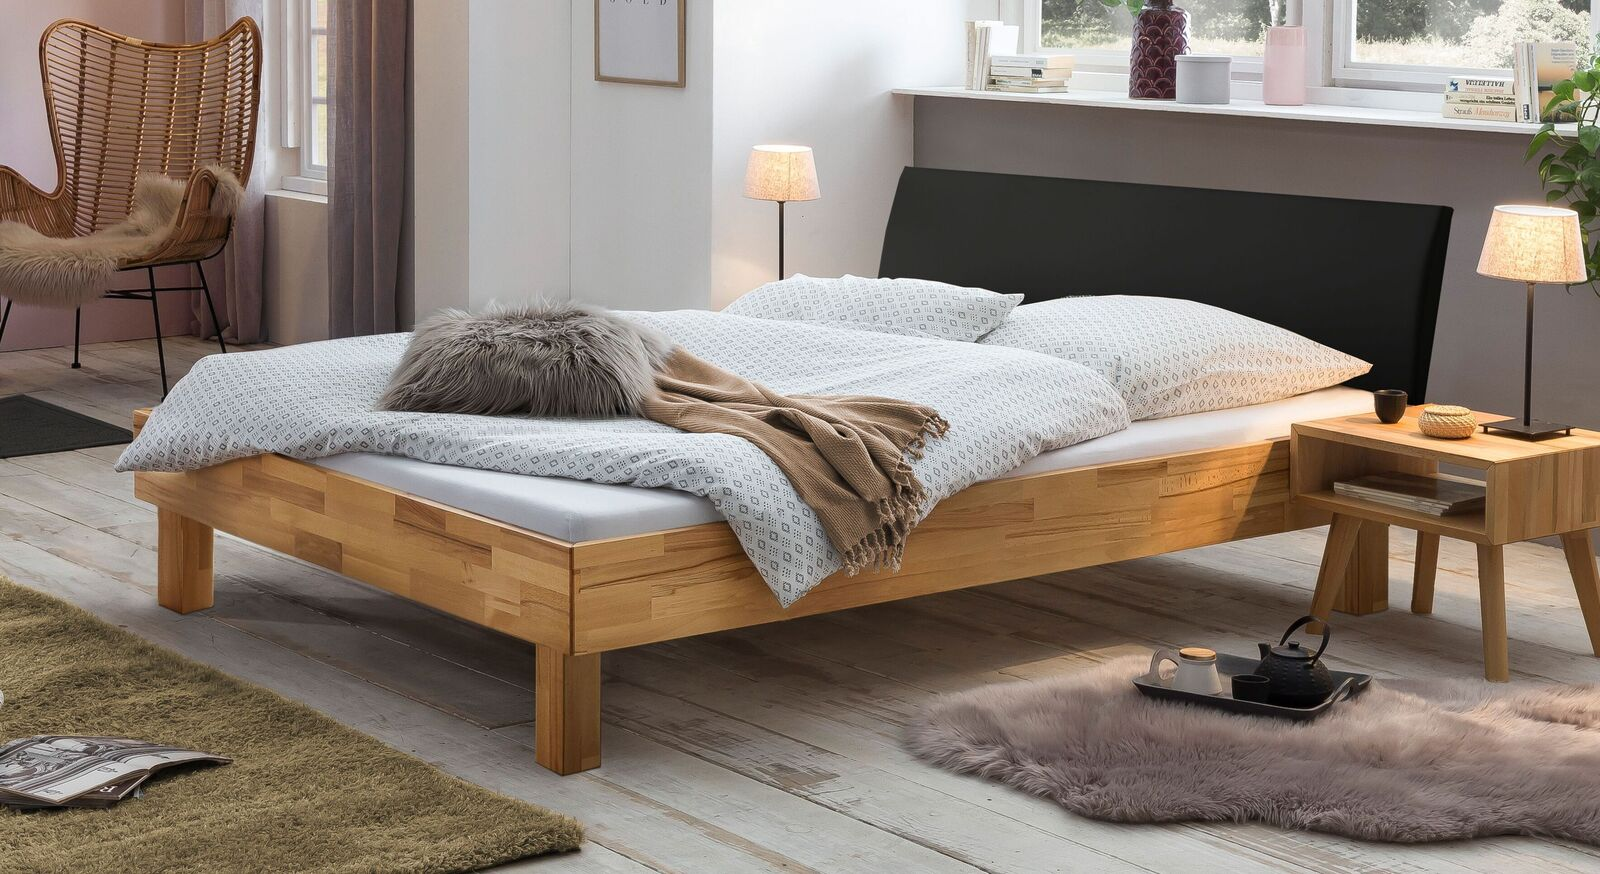 Bett Amsden aus Echtholz massiv